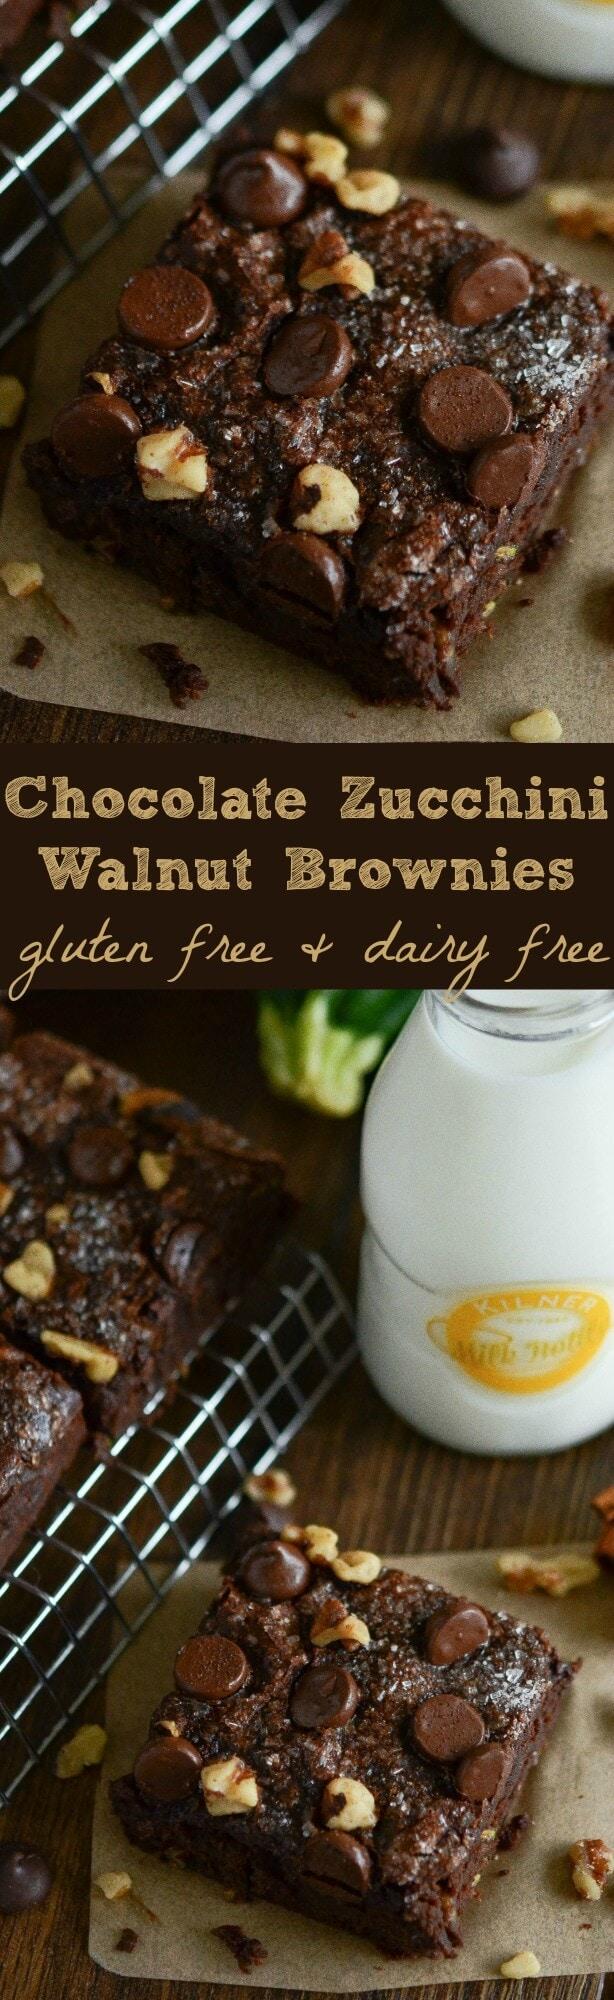 Chocolate Zucchini Walnut Brownies - rich dark chocolate brownies filled with zucchini, cinnamon and walnuts are gluten free and diary free!